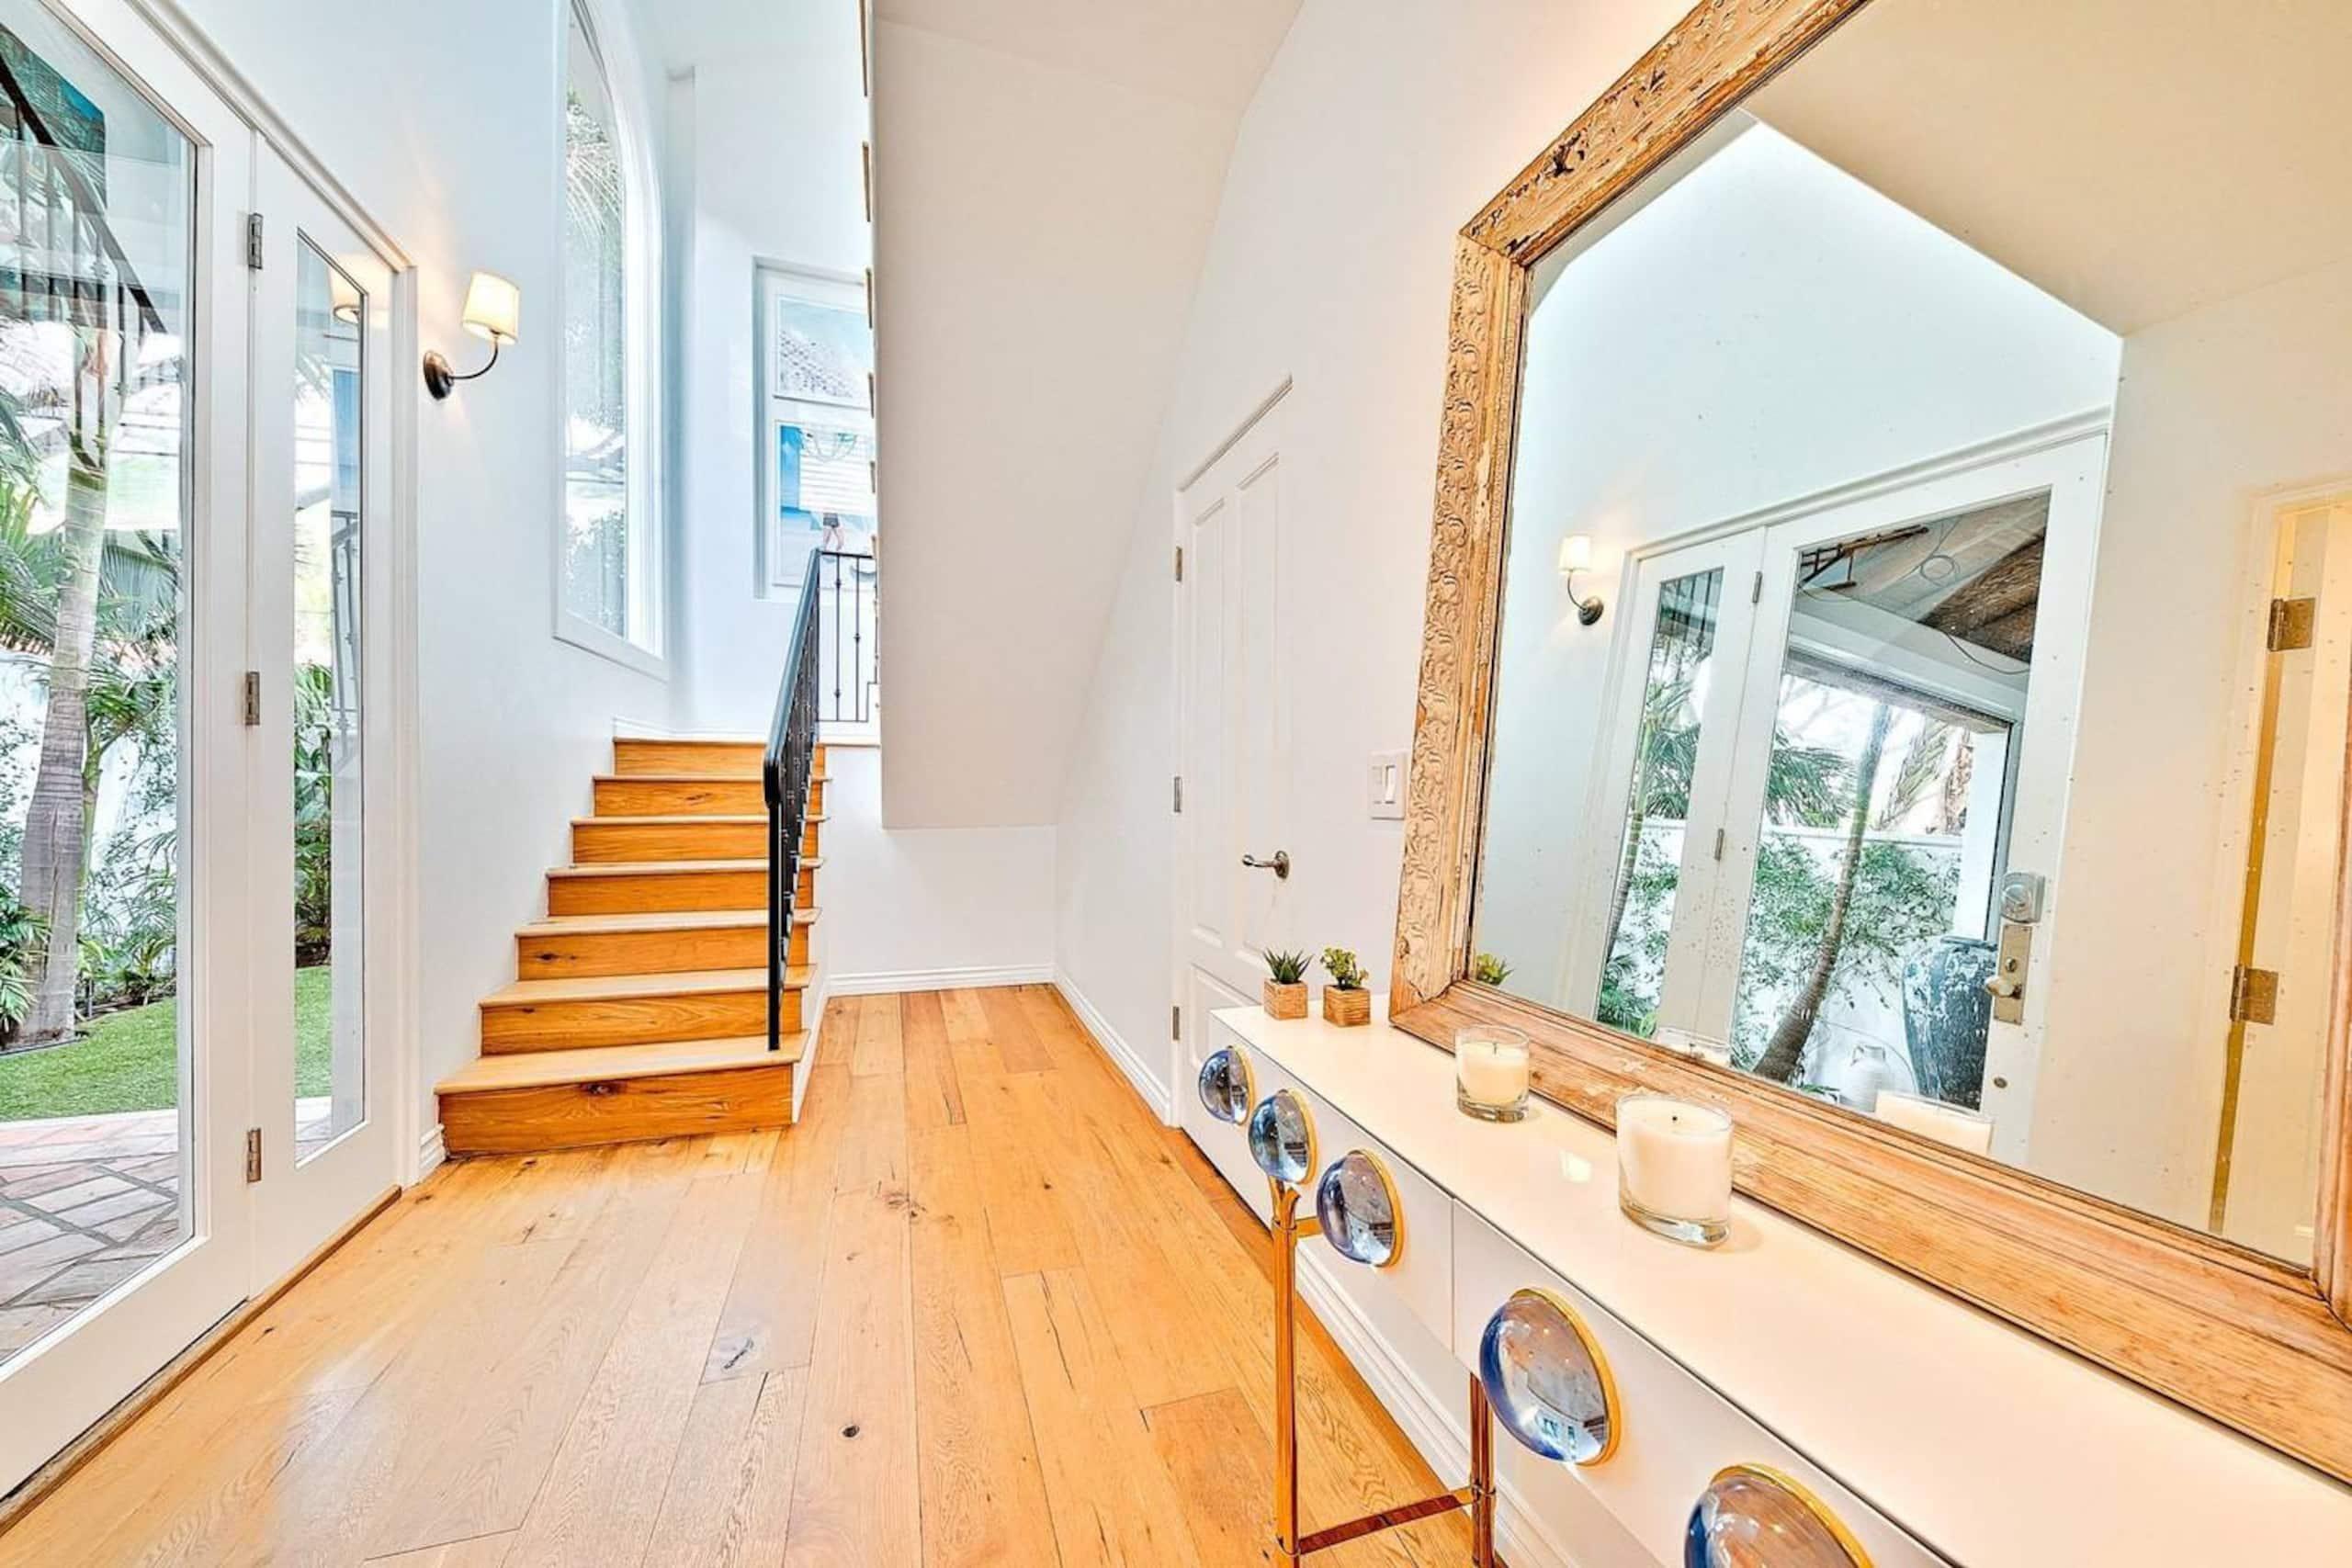 Apartment Villa Shawaiz - Beachfront Villa with 5 beds  photo 20368003